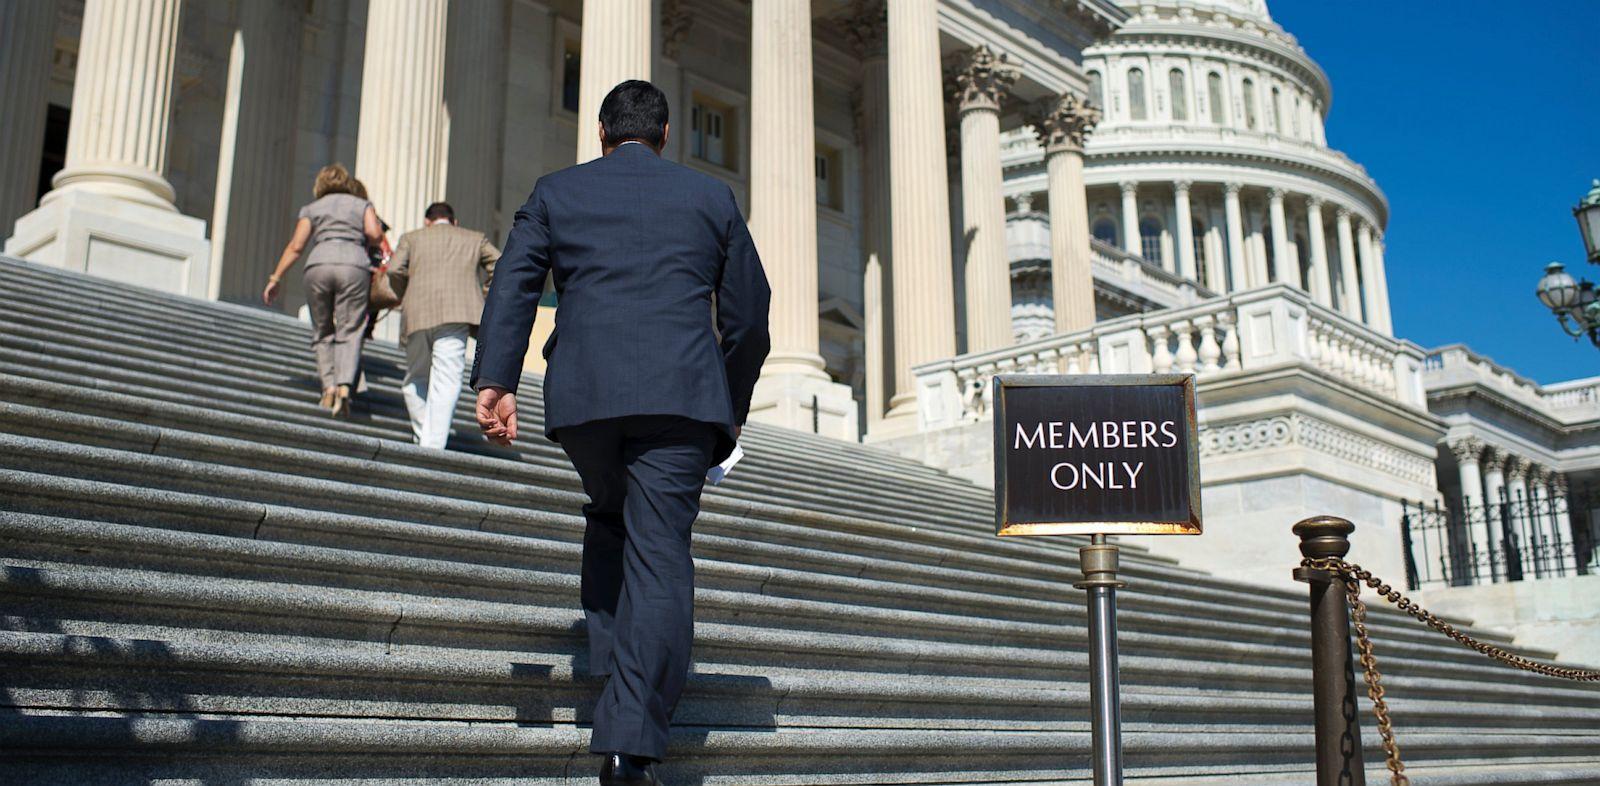 PHOTO: House representatives on Capitol steps